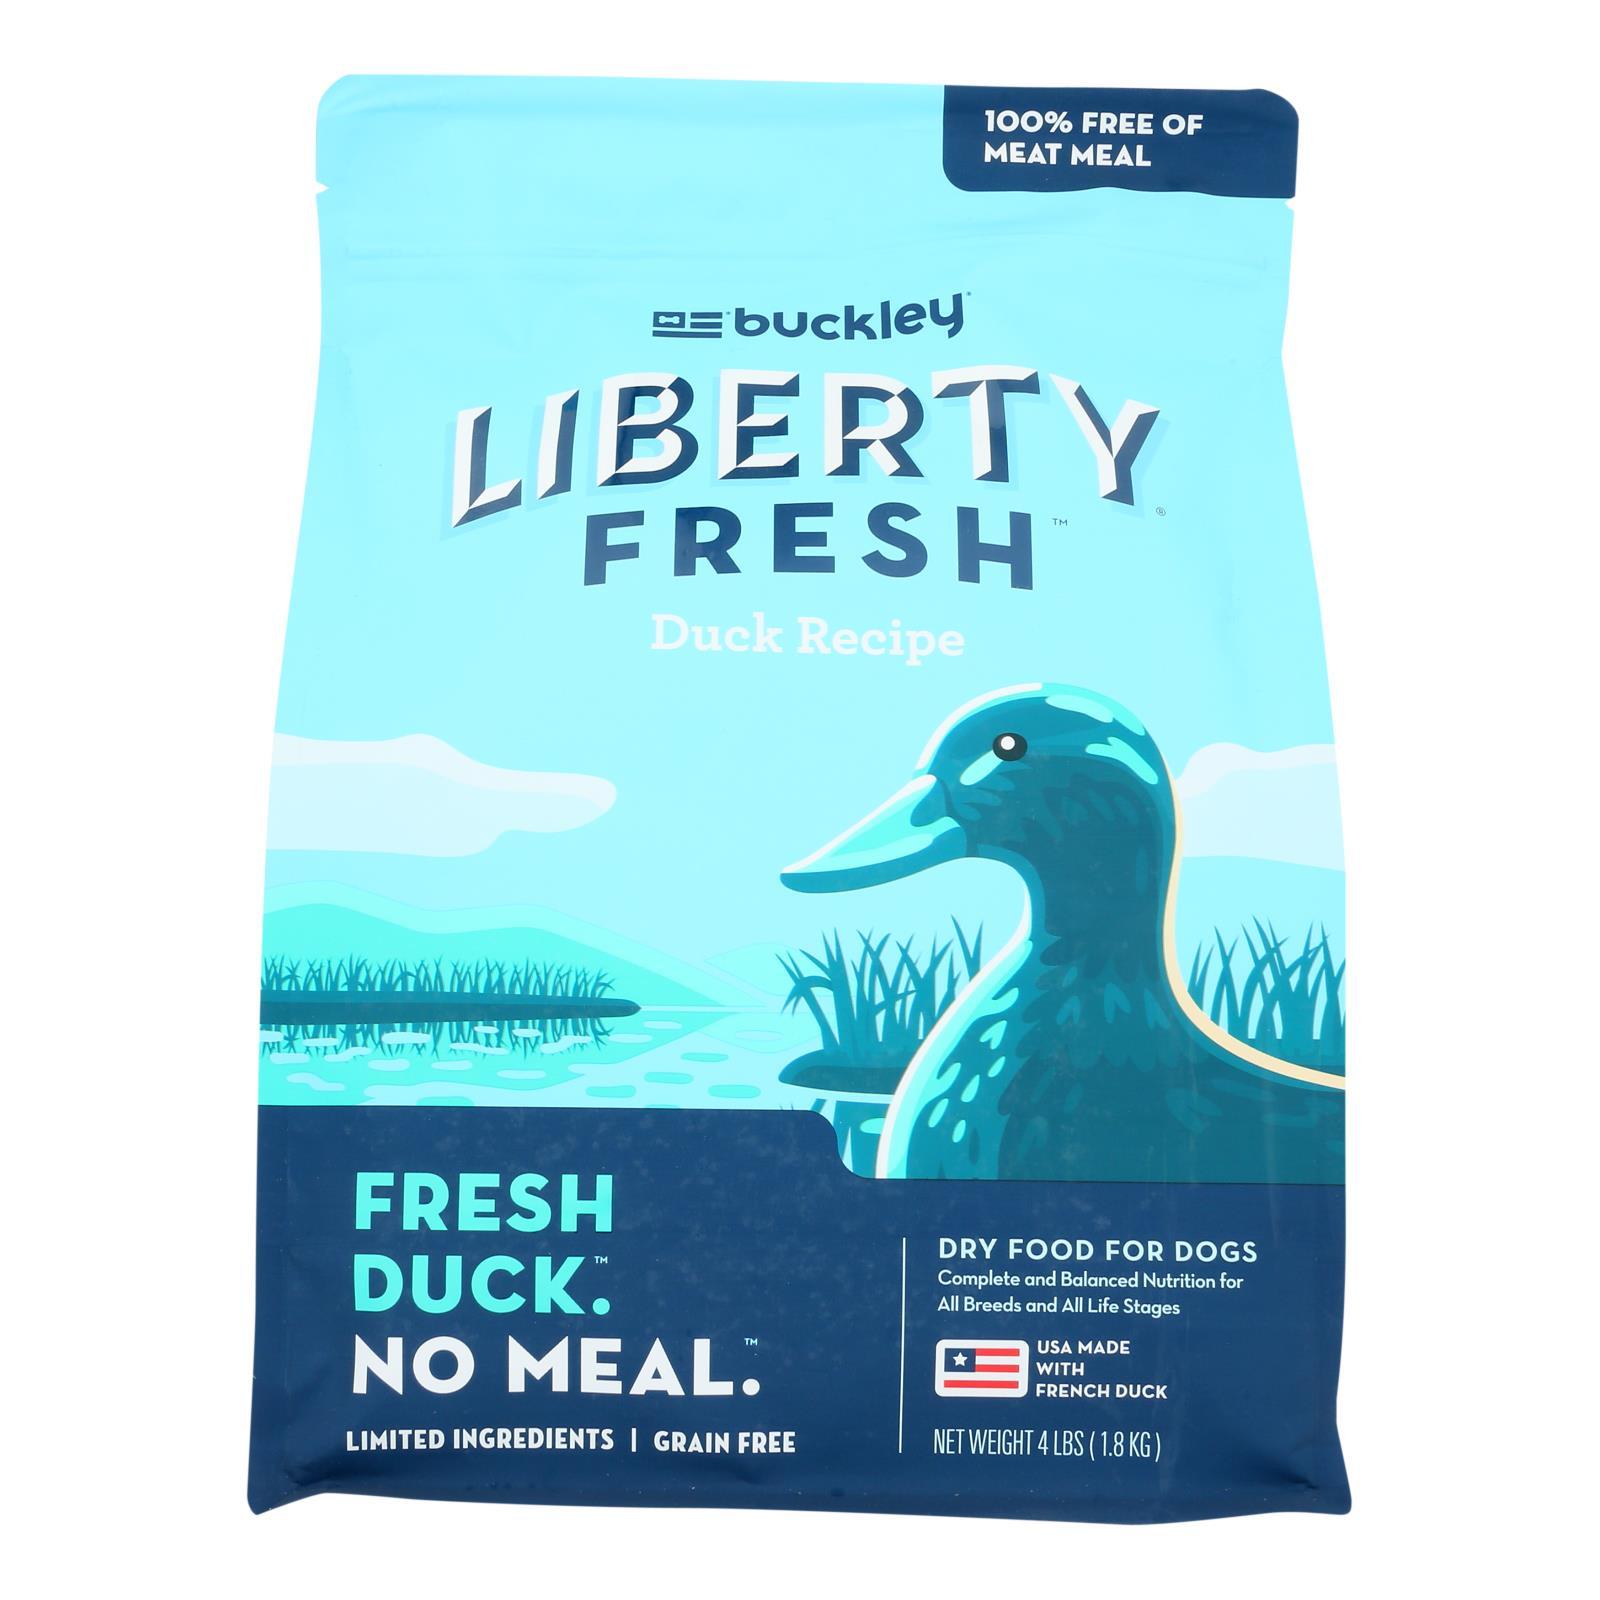 Buckley - Liberty Fresh Duck - Case of 6 - 4 LB